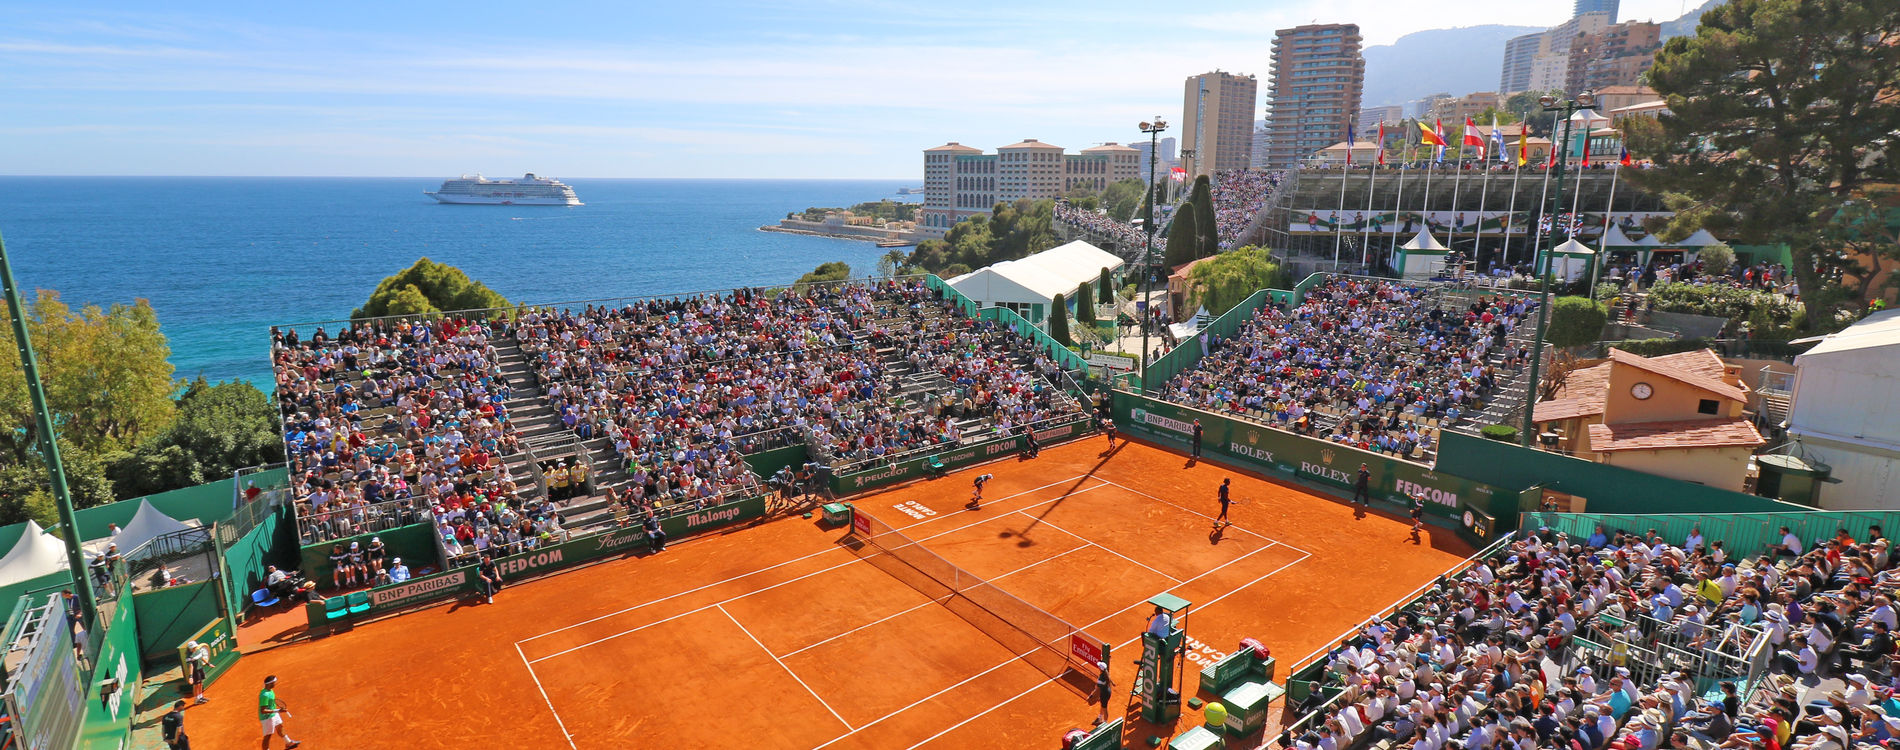 Monte-Carlo Country Club - Monte-Carlo Rolex Masters